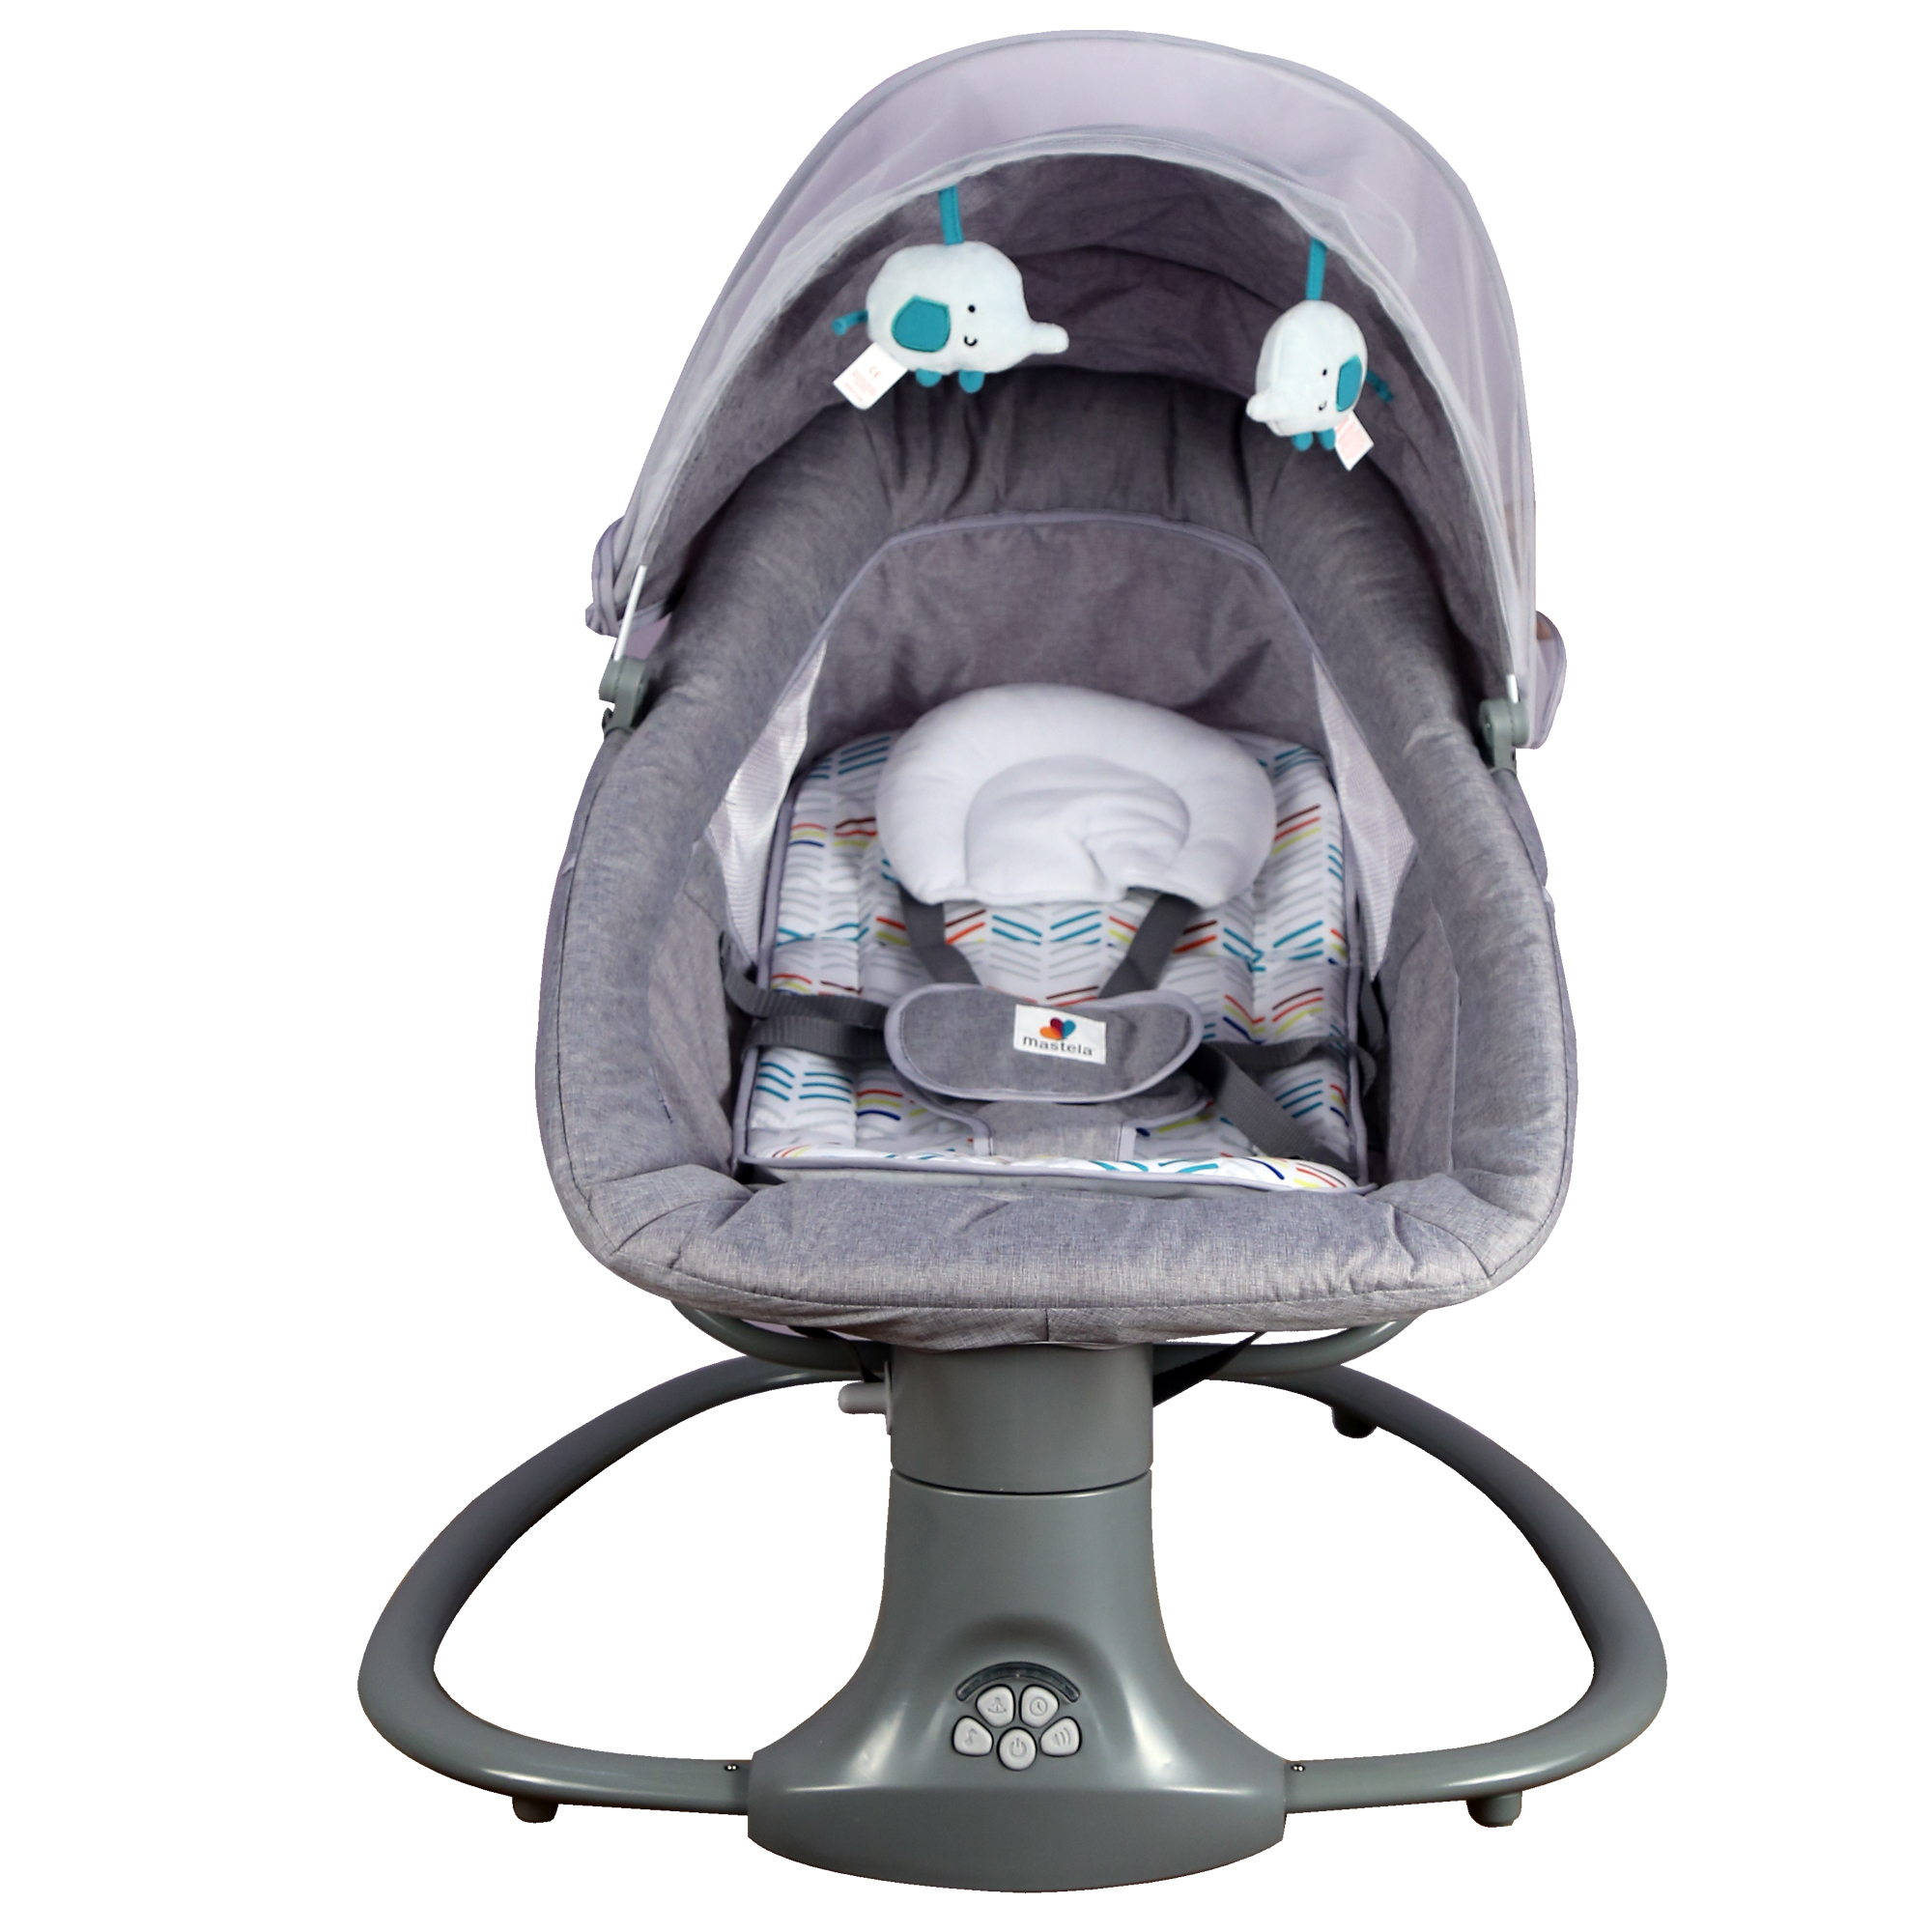 Mothercare | Mastela Deluxe Multi-Function Swing 8104 Grey